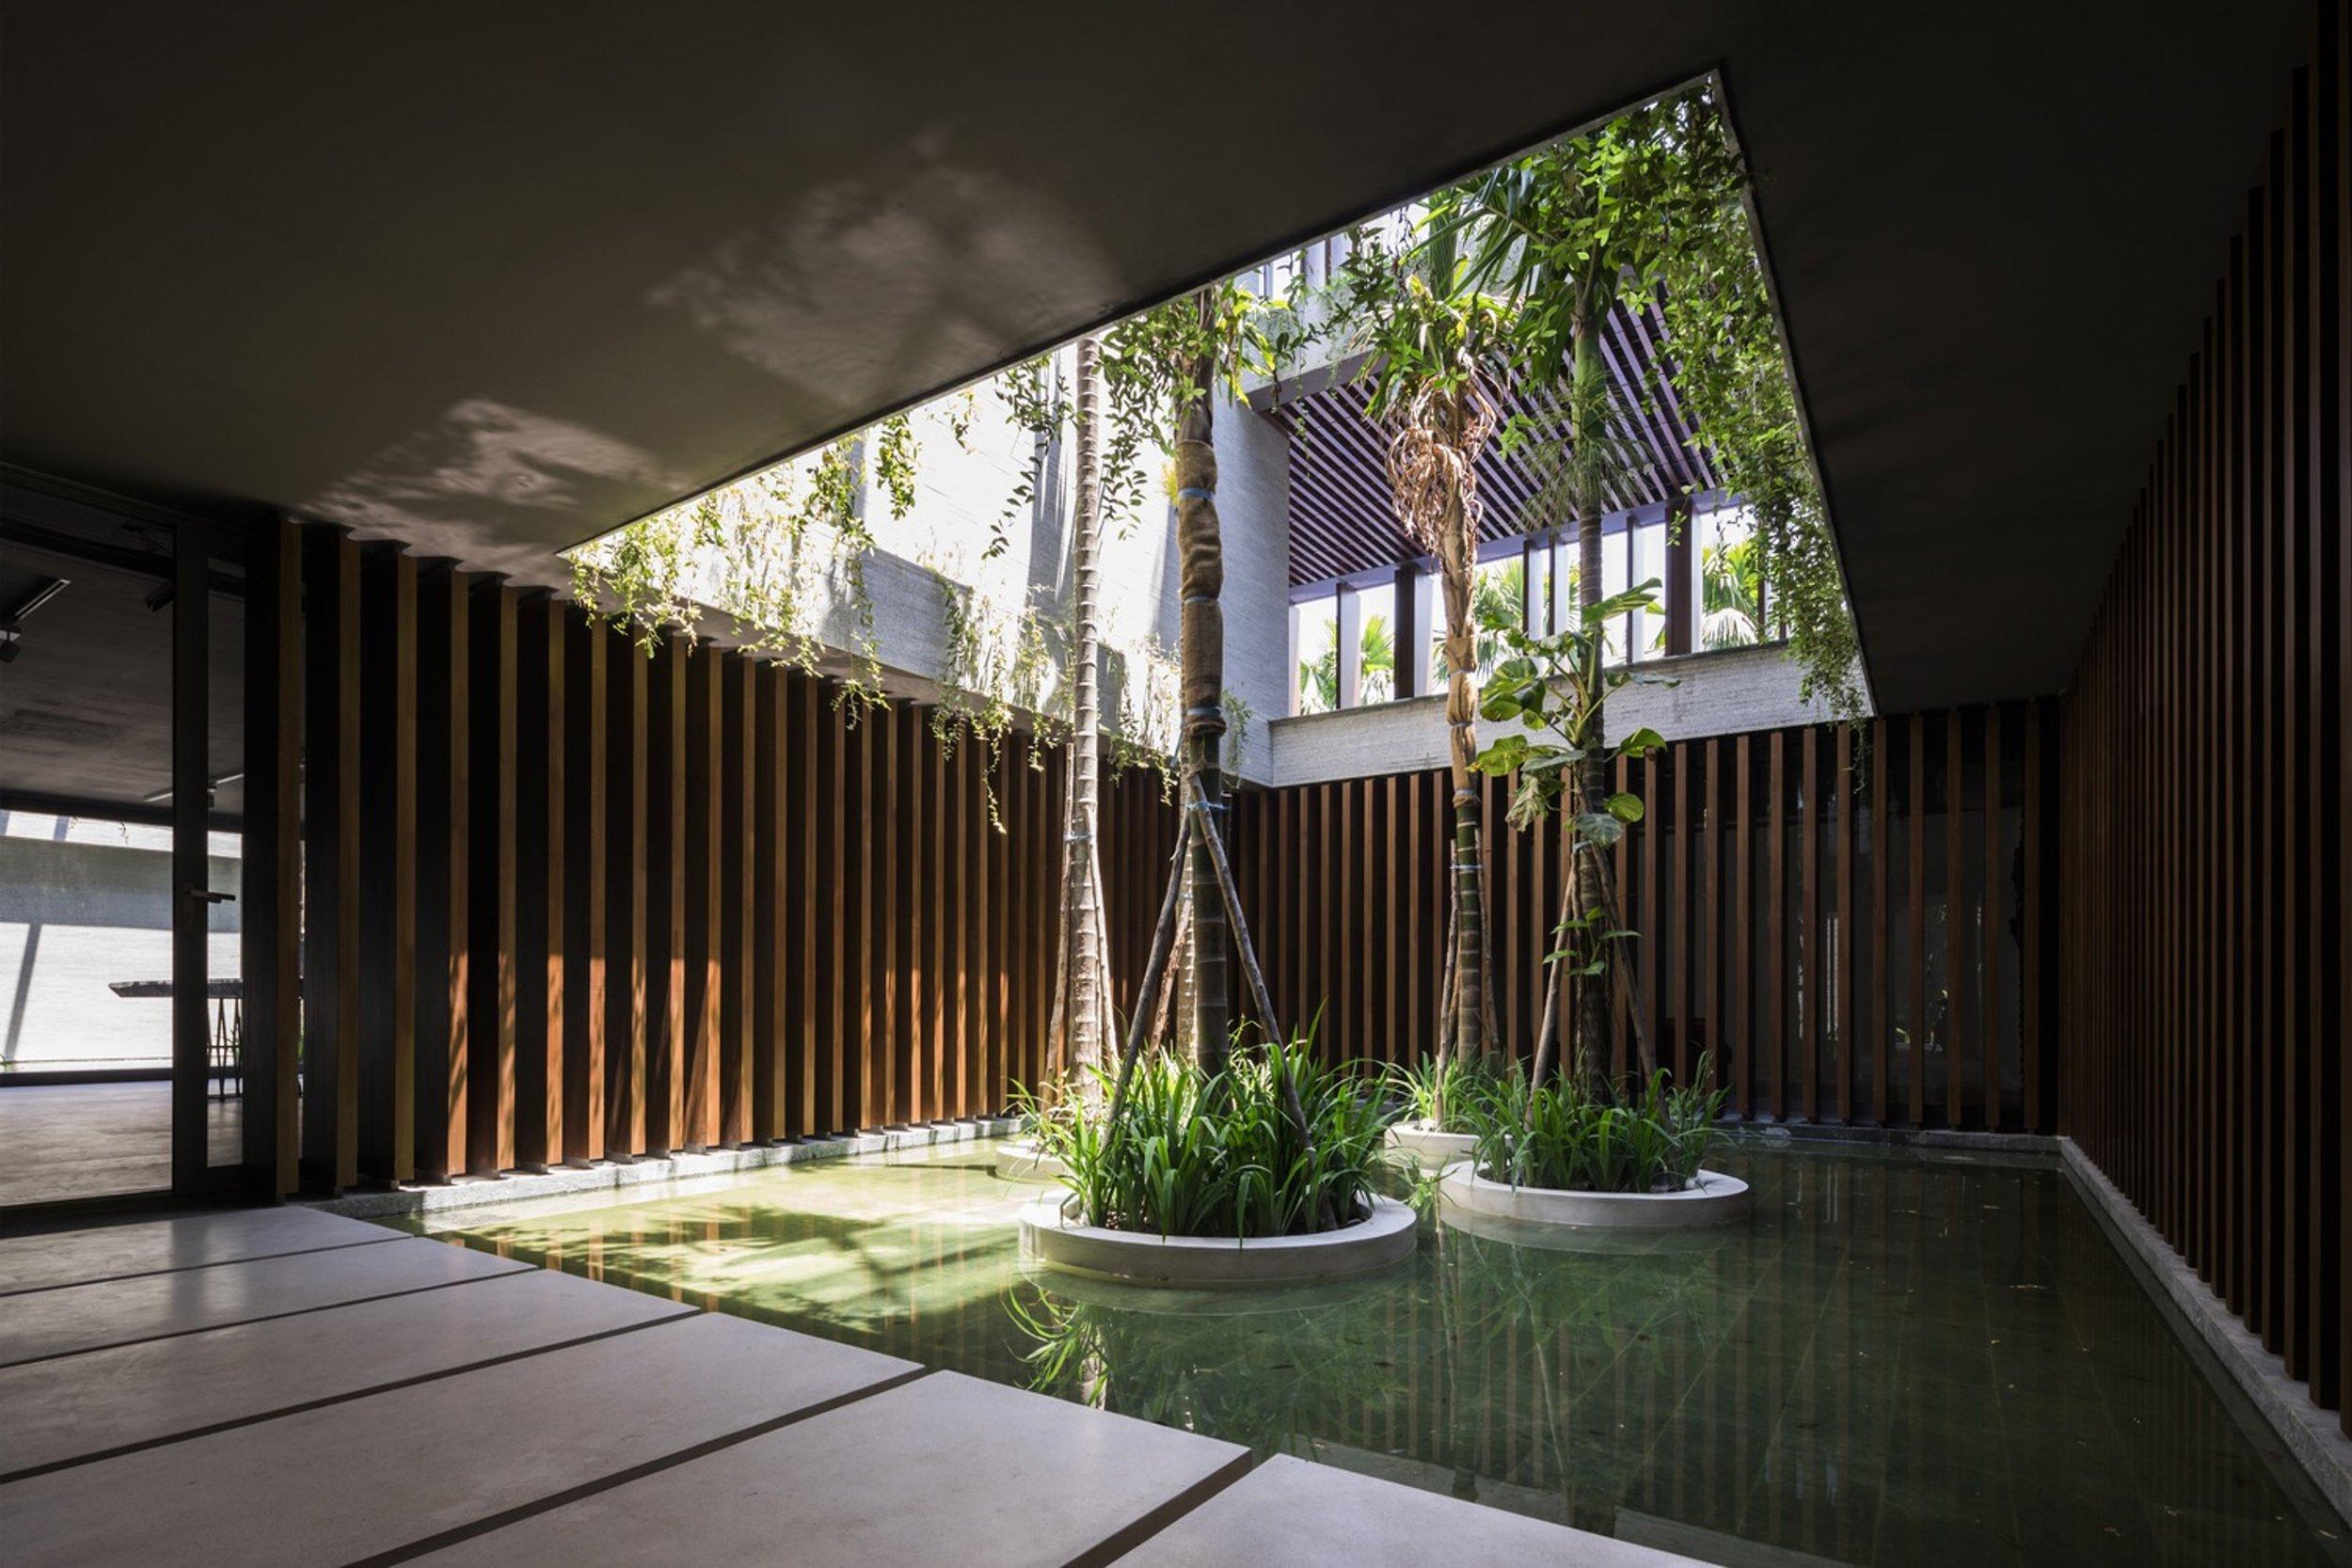 louvers-house-mia-design-studio-9.jpg